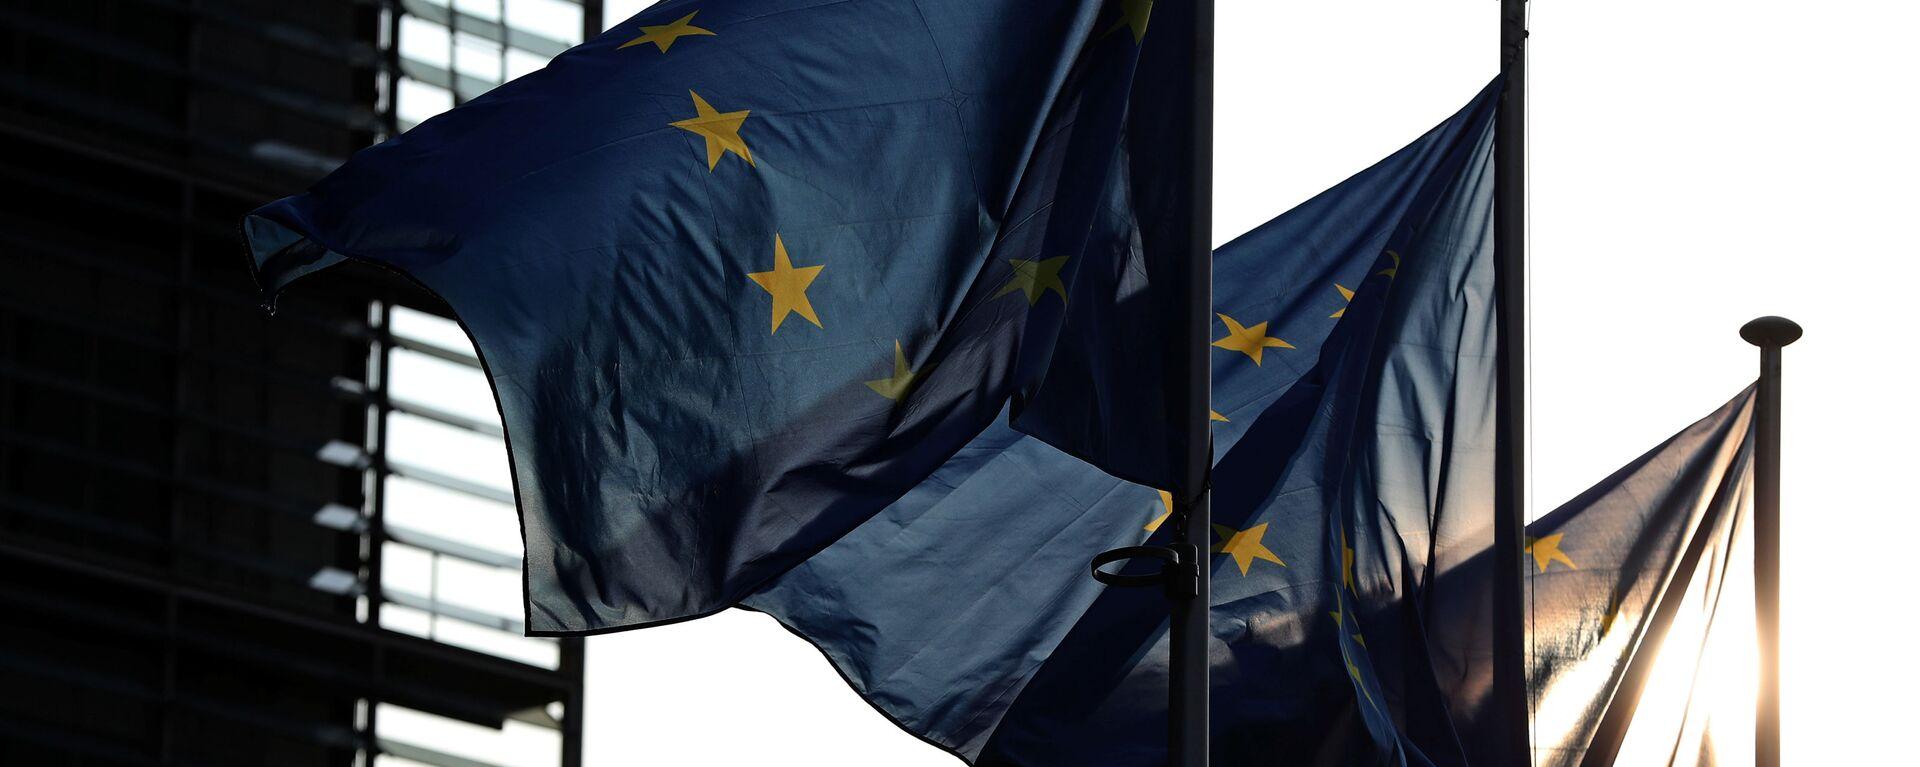 Флаги ЕС в Брюсселе - Sputnik Узбекистан, 1920, 08.09.2021